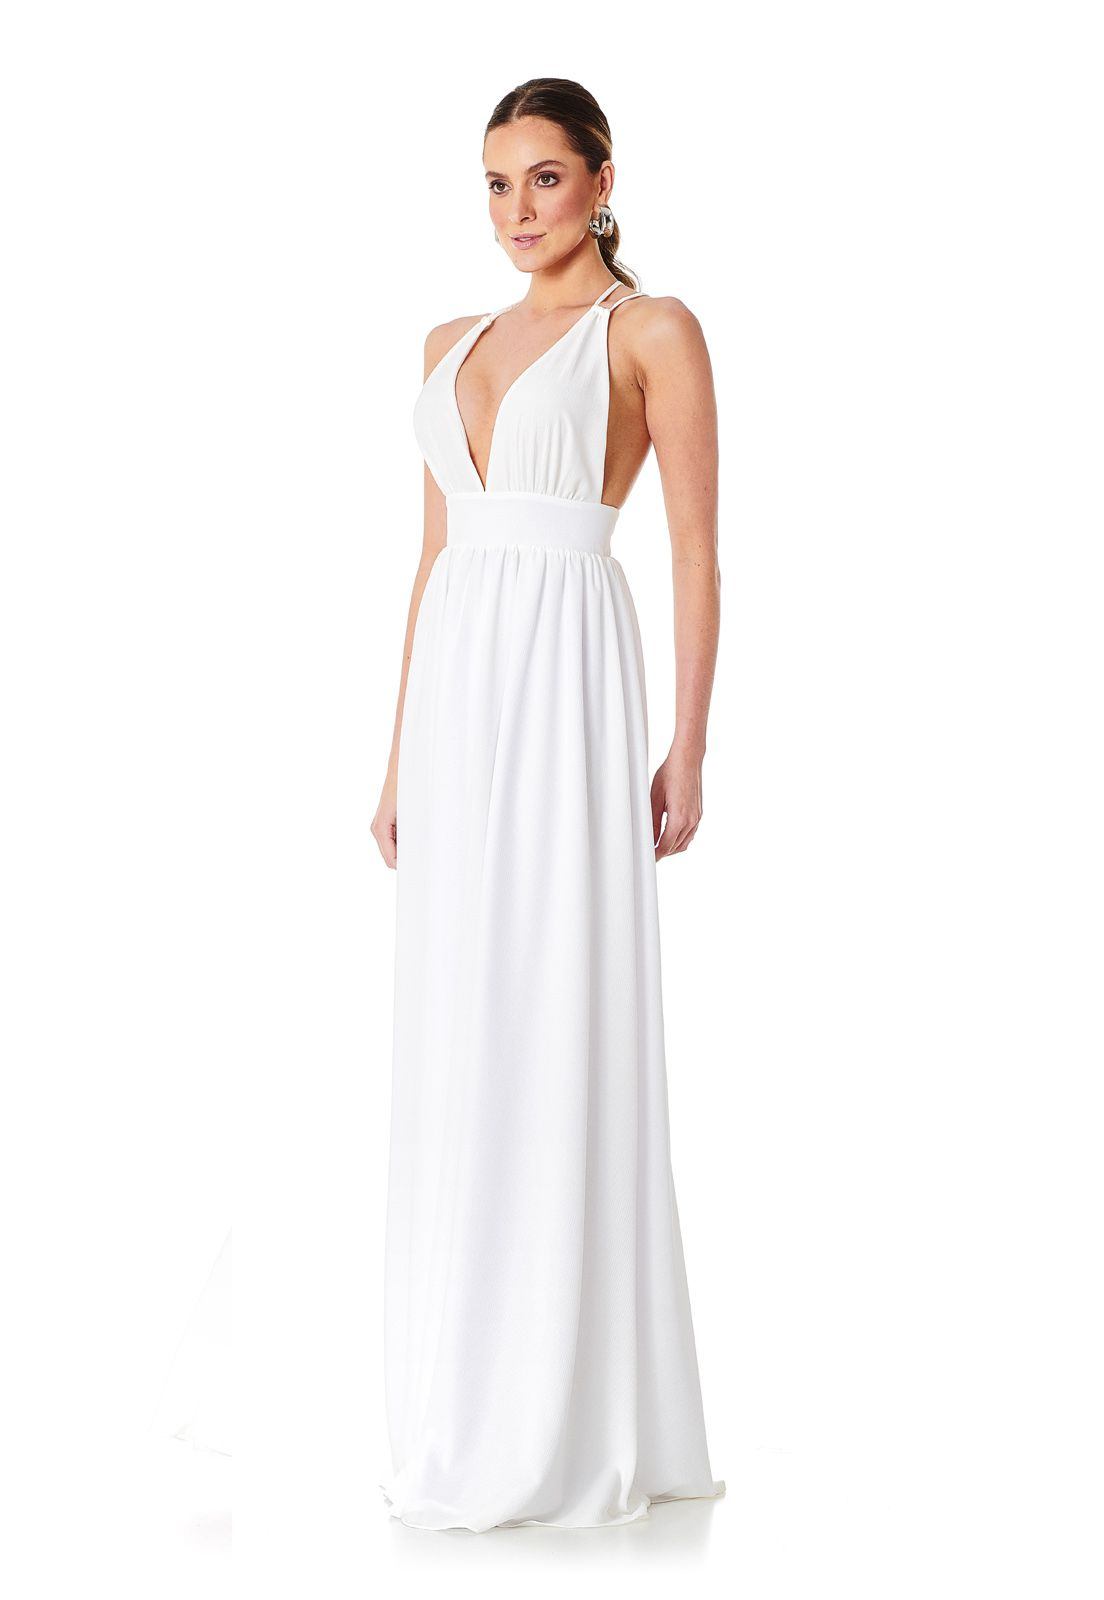 Vestido Longo Costas Cruzadas Branco Lala Dubi